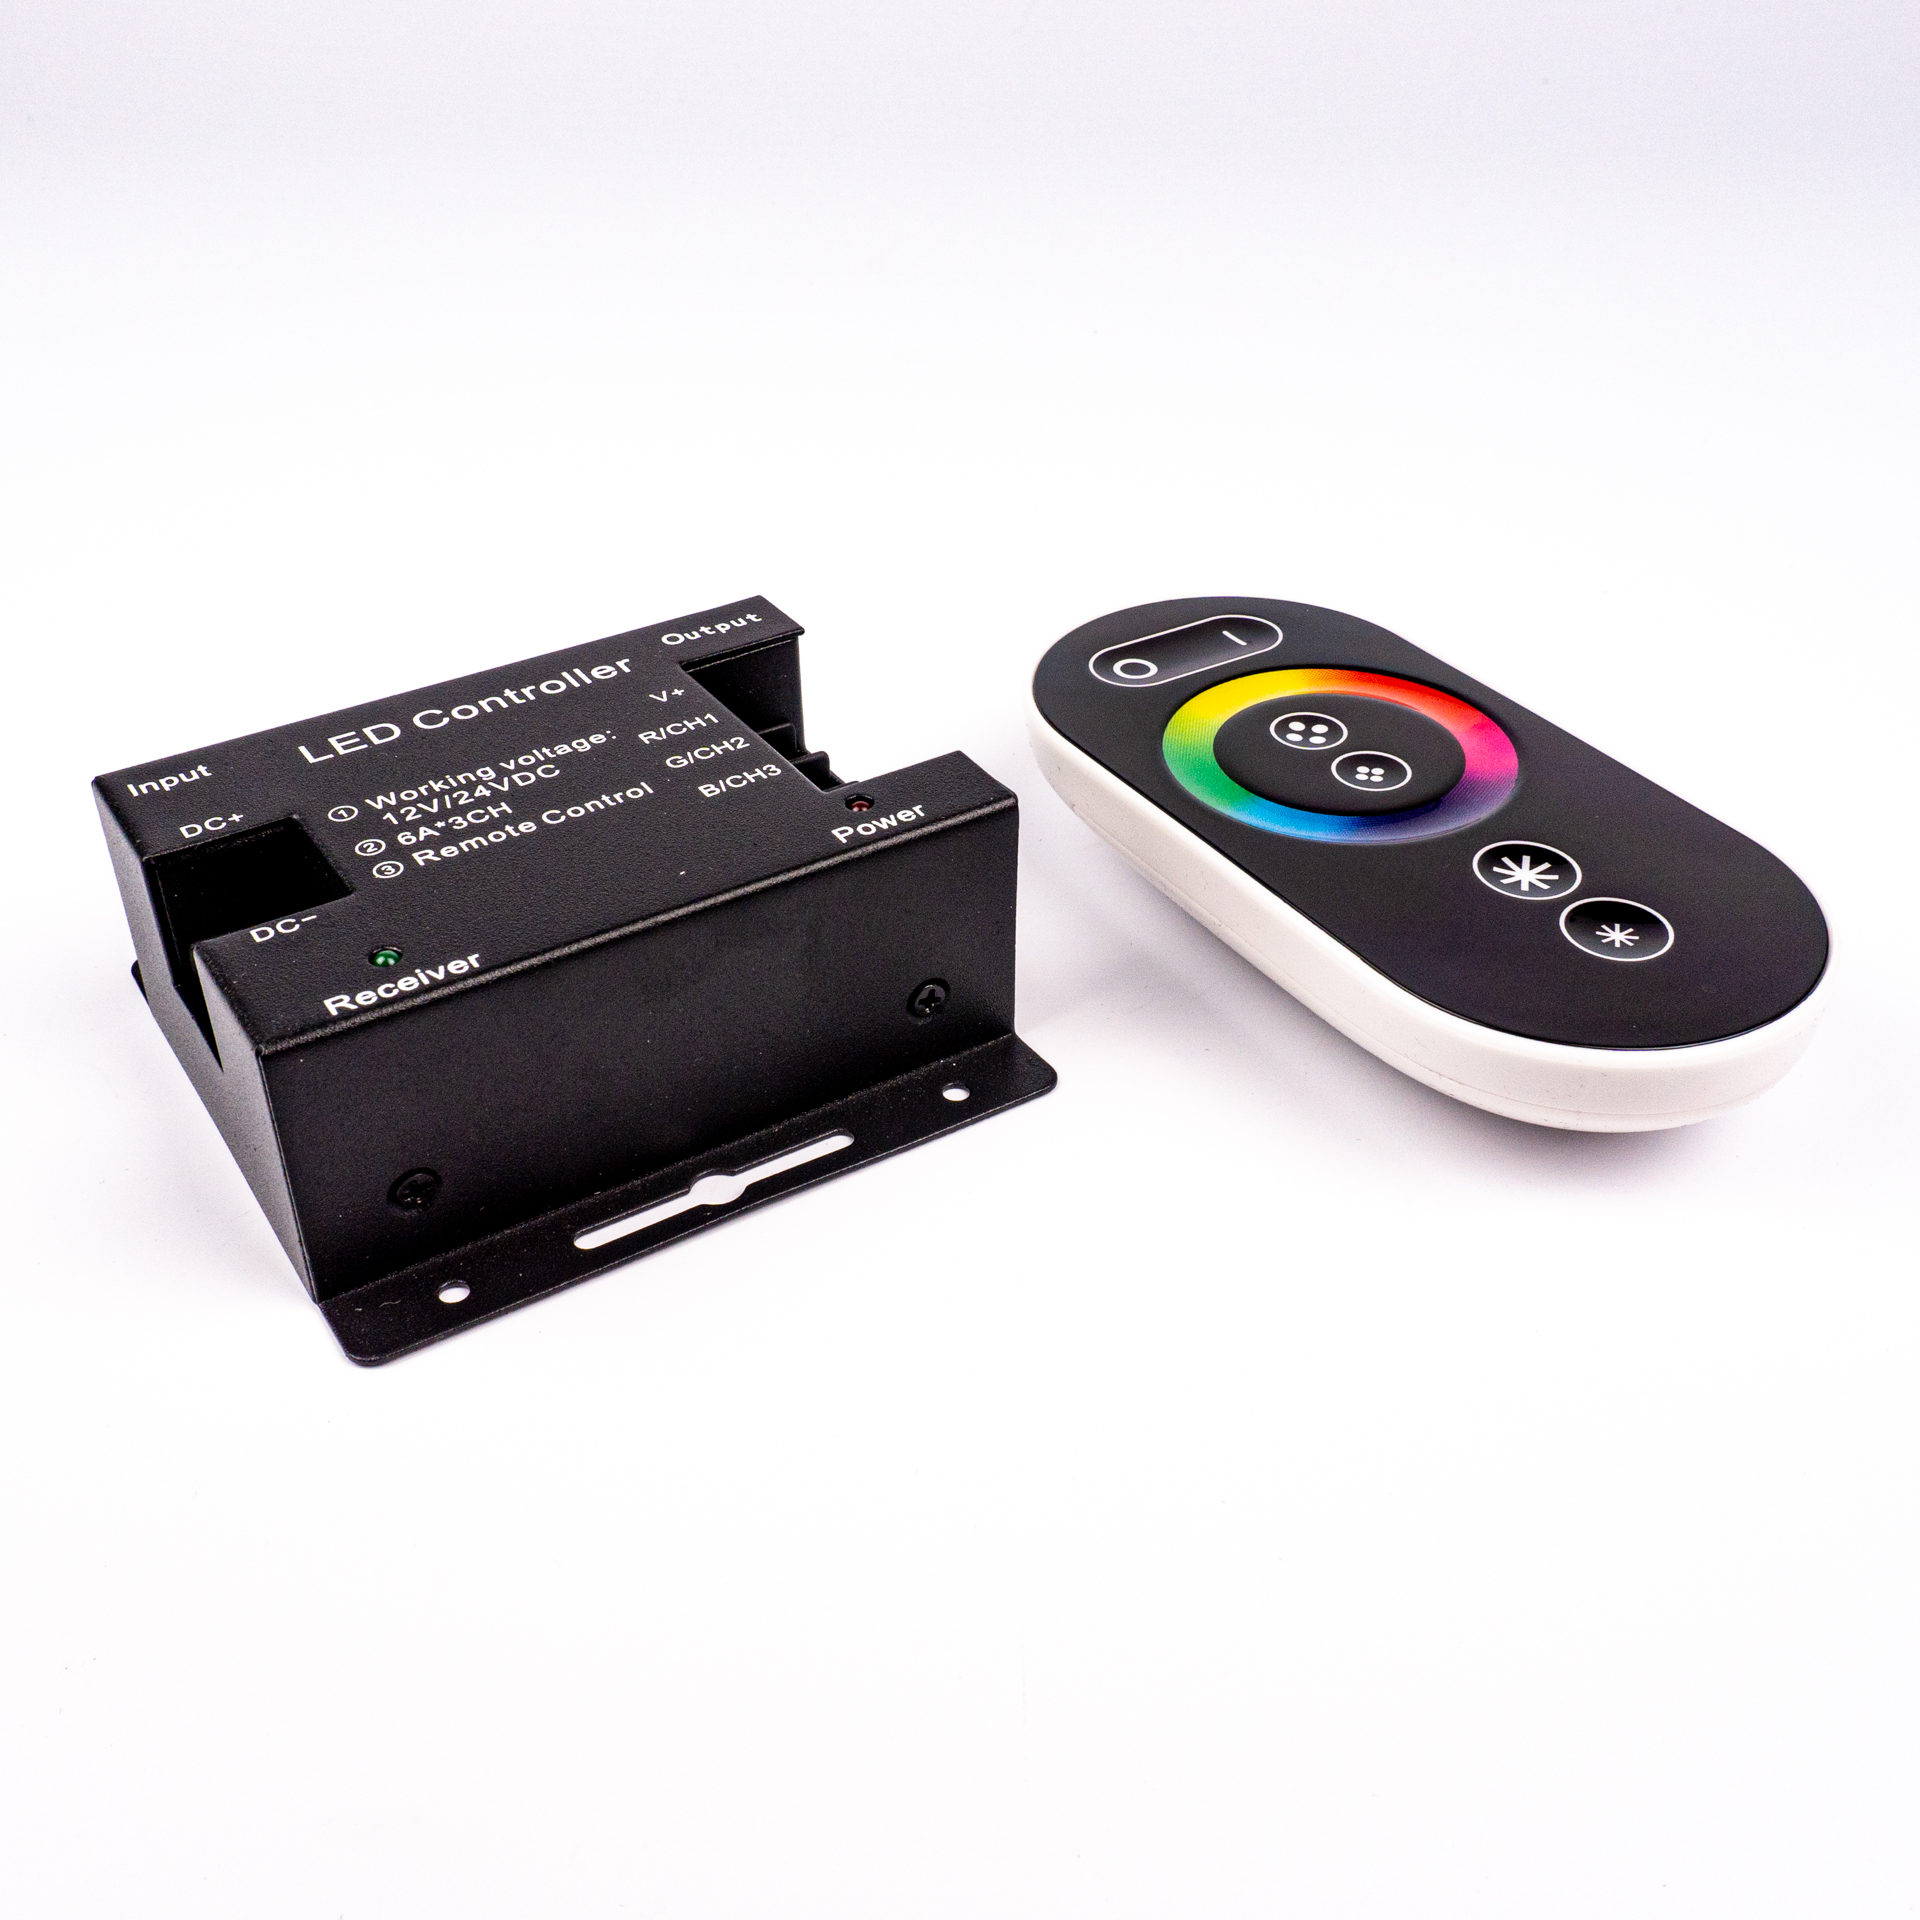 LED Szalag Vezérlő Touch RGB 3 Csatornás RF 12V-24V 18A 216W/432W LC-TRGBRF